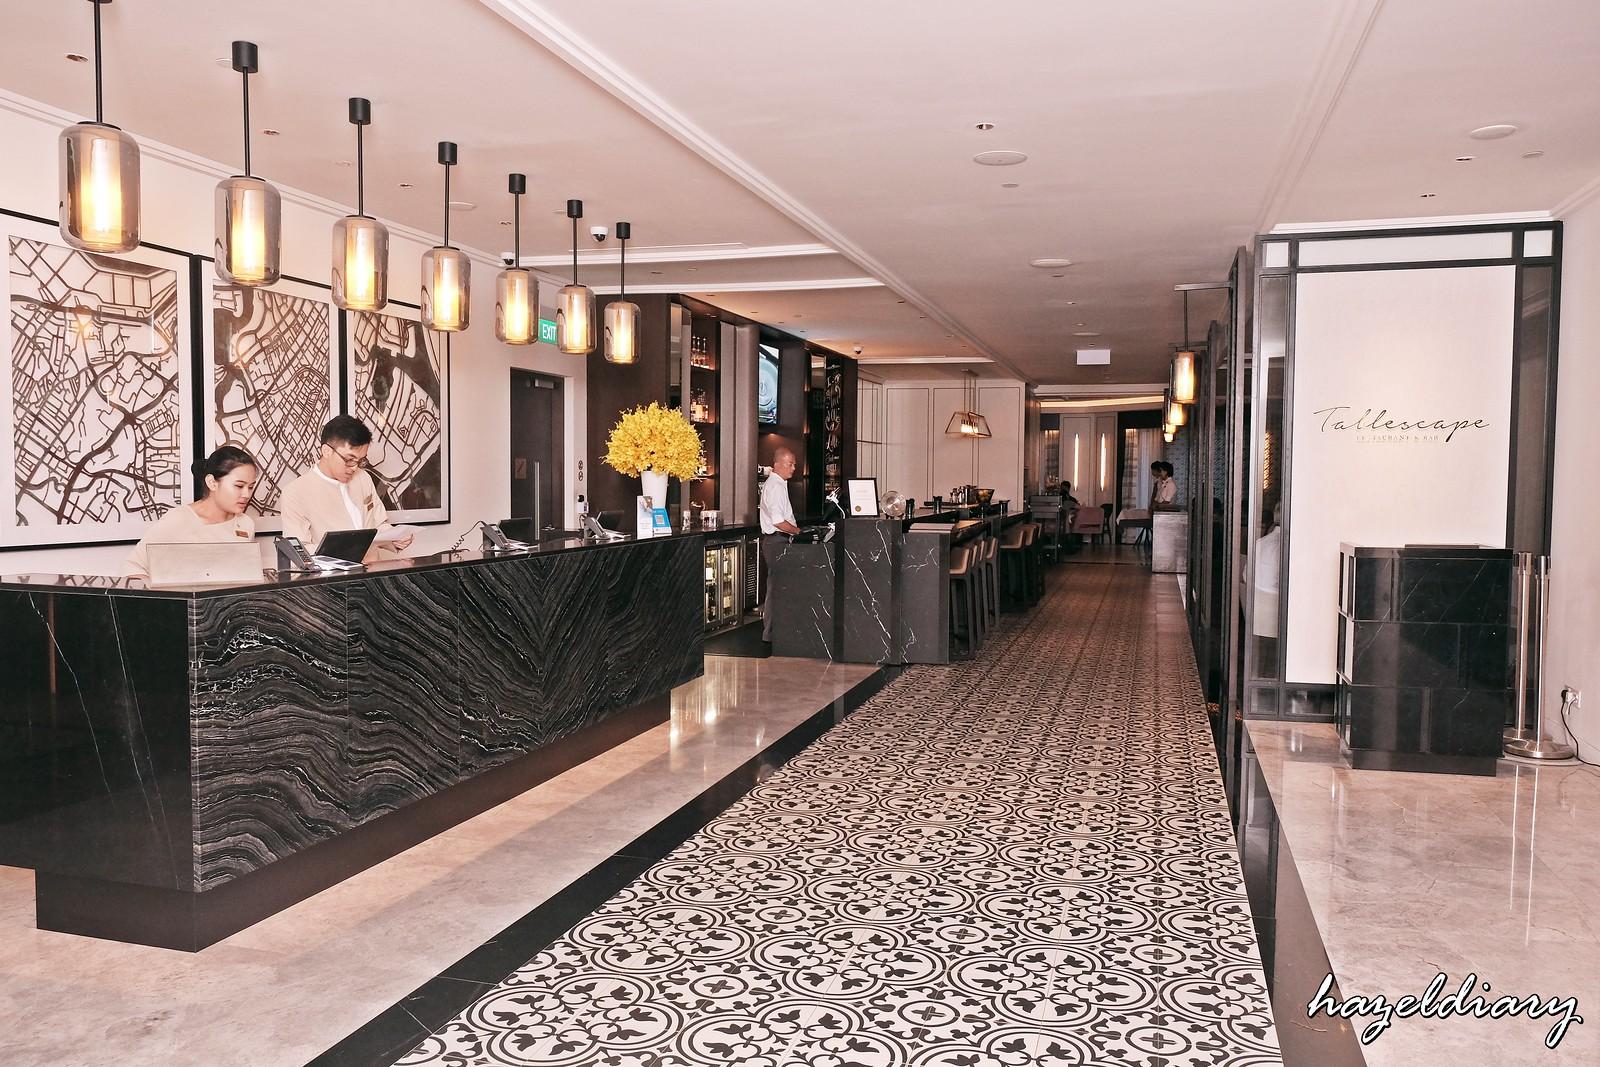 Tablescape Restaurant and Bar Grand Park City Hall-1